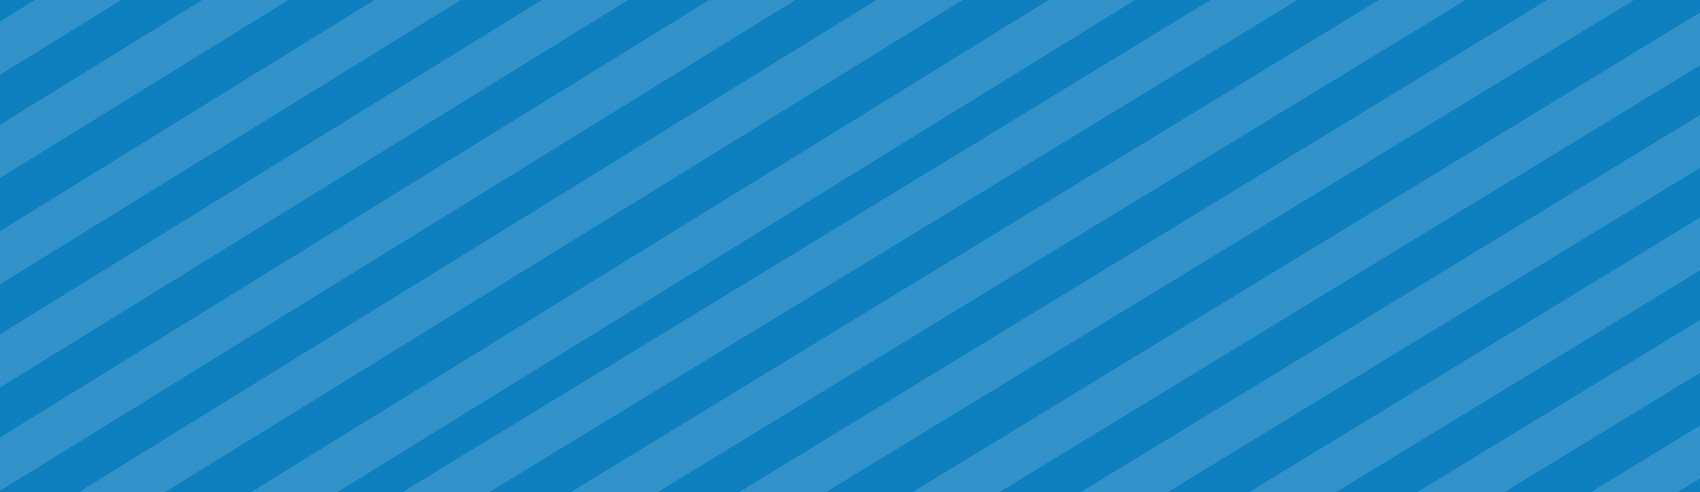 blue-stripe-background_1700x492